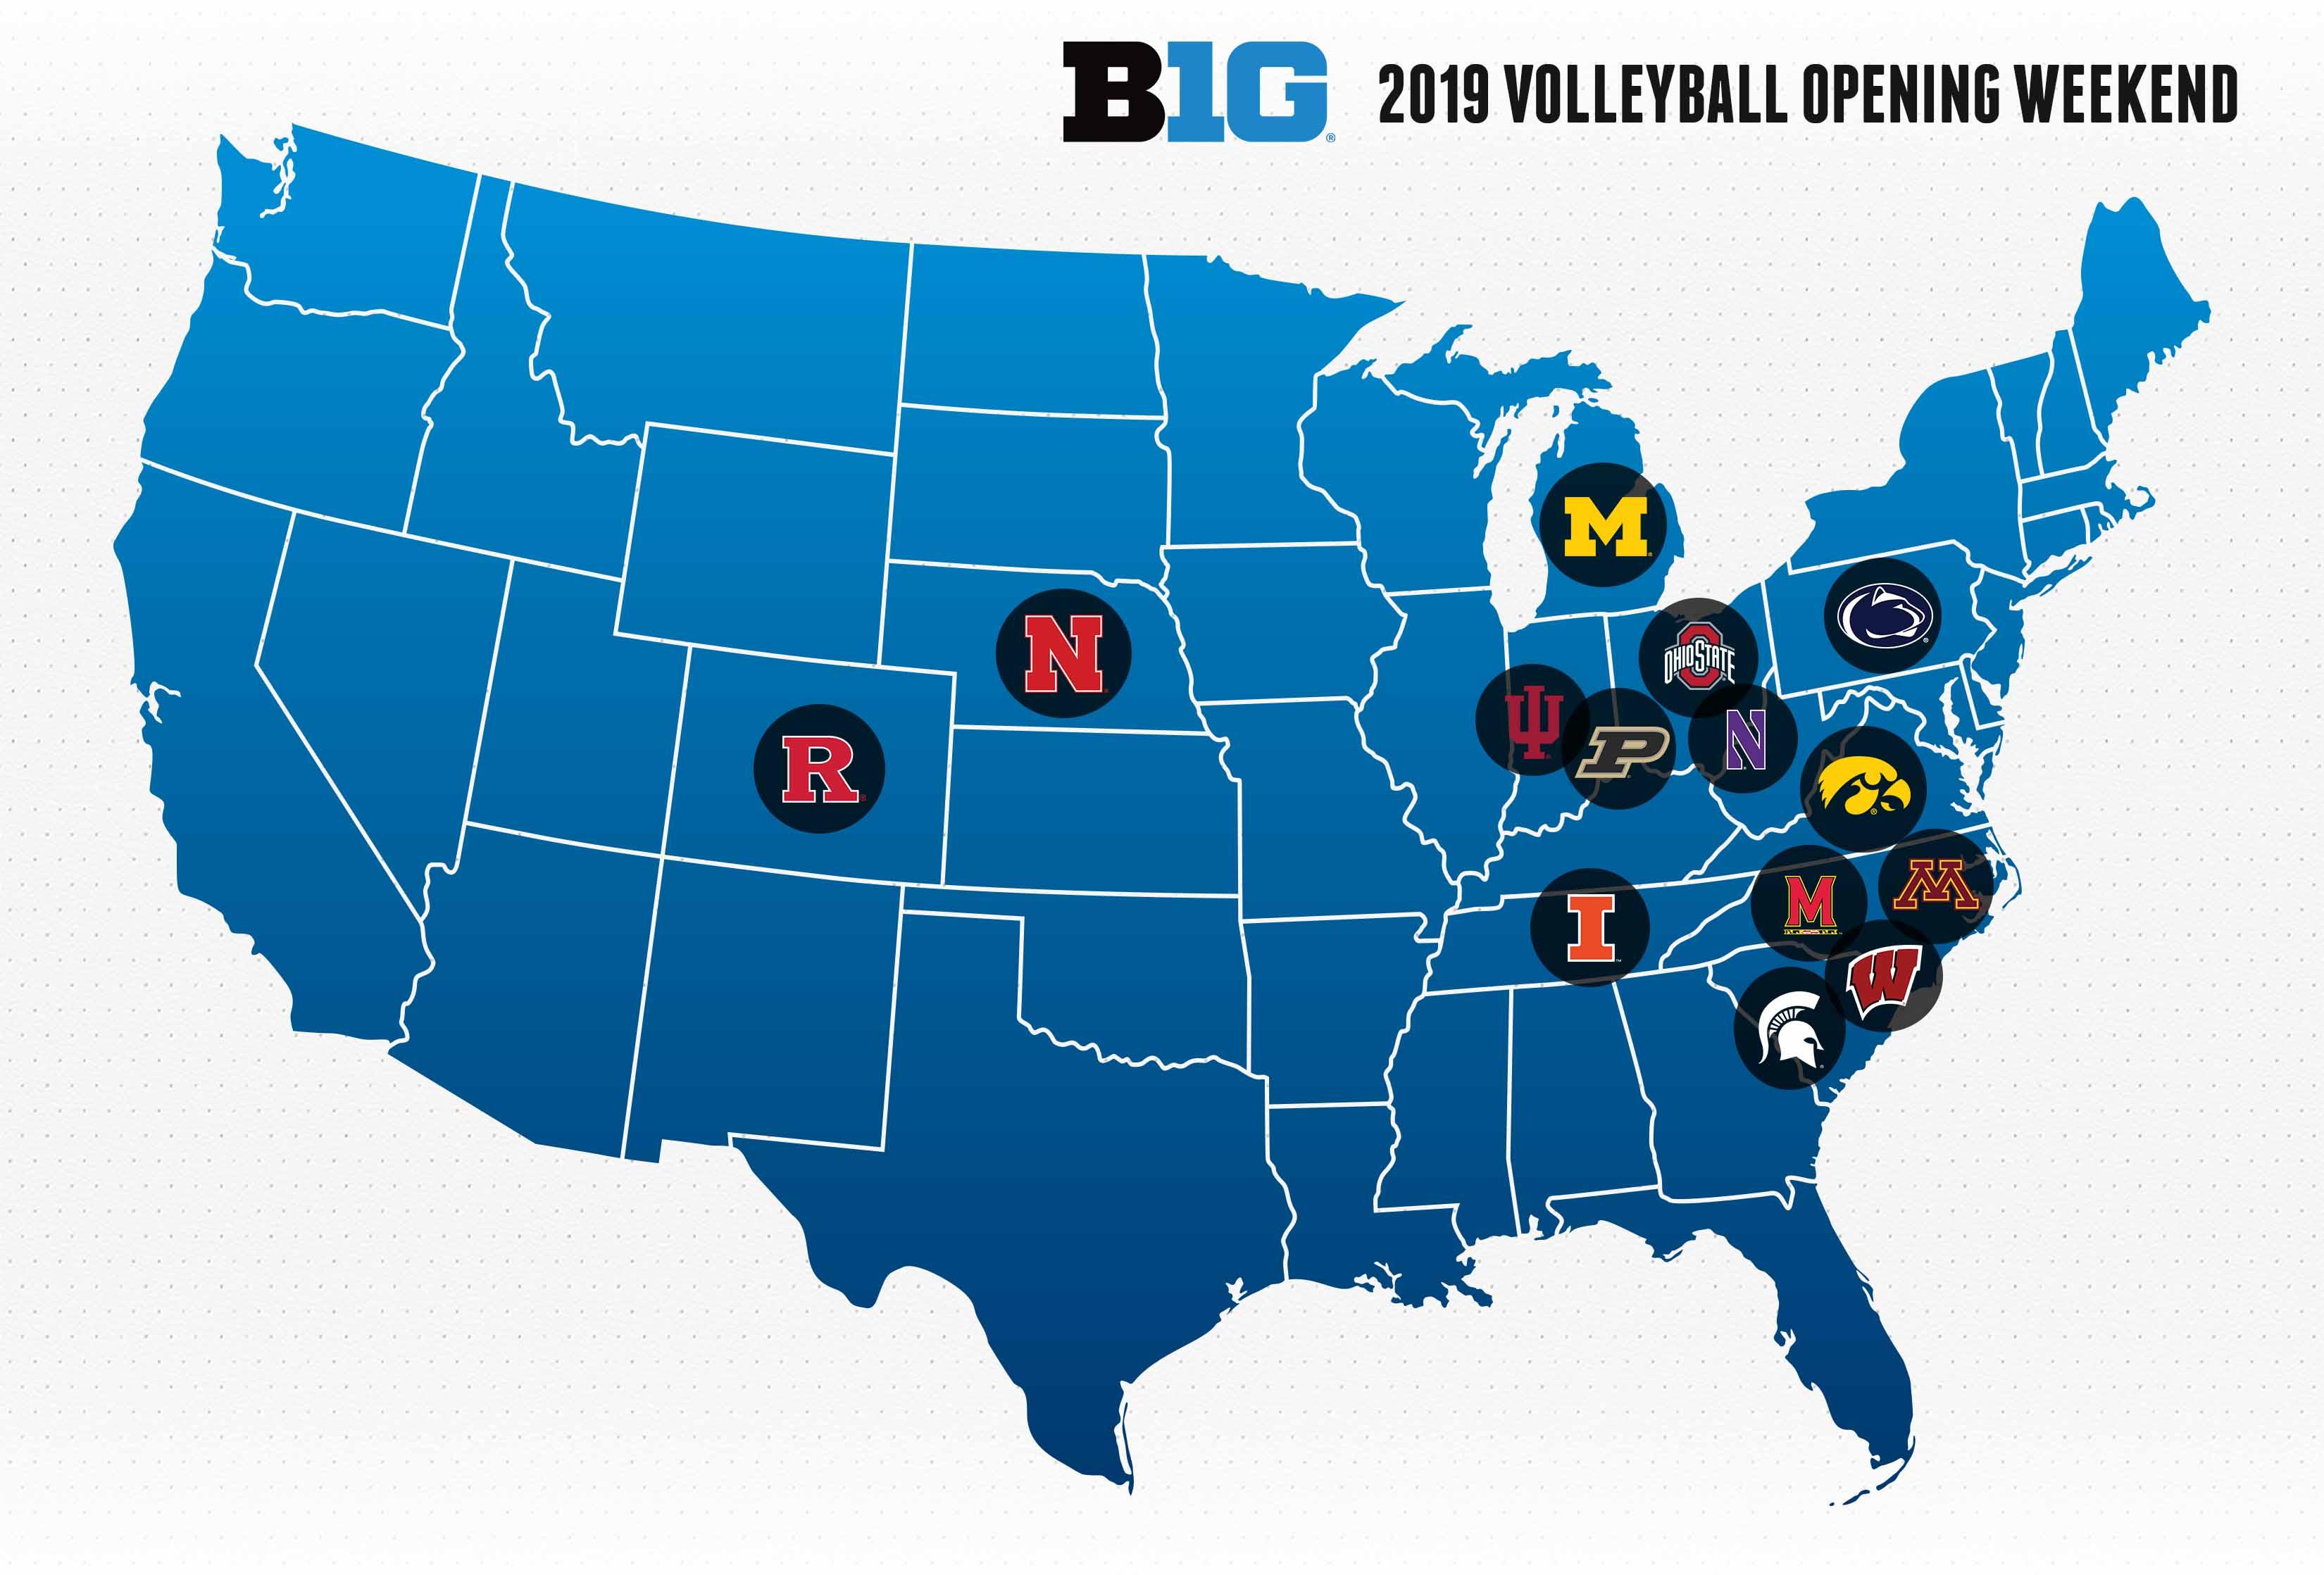 2019 Big Ten Volleyball Opening Weekend Matches